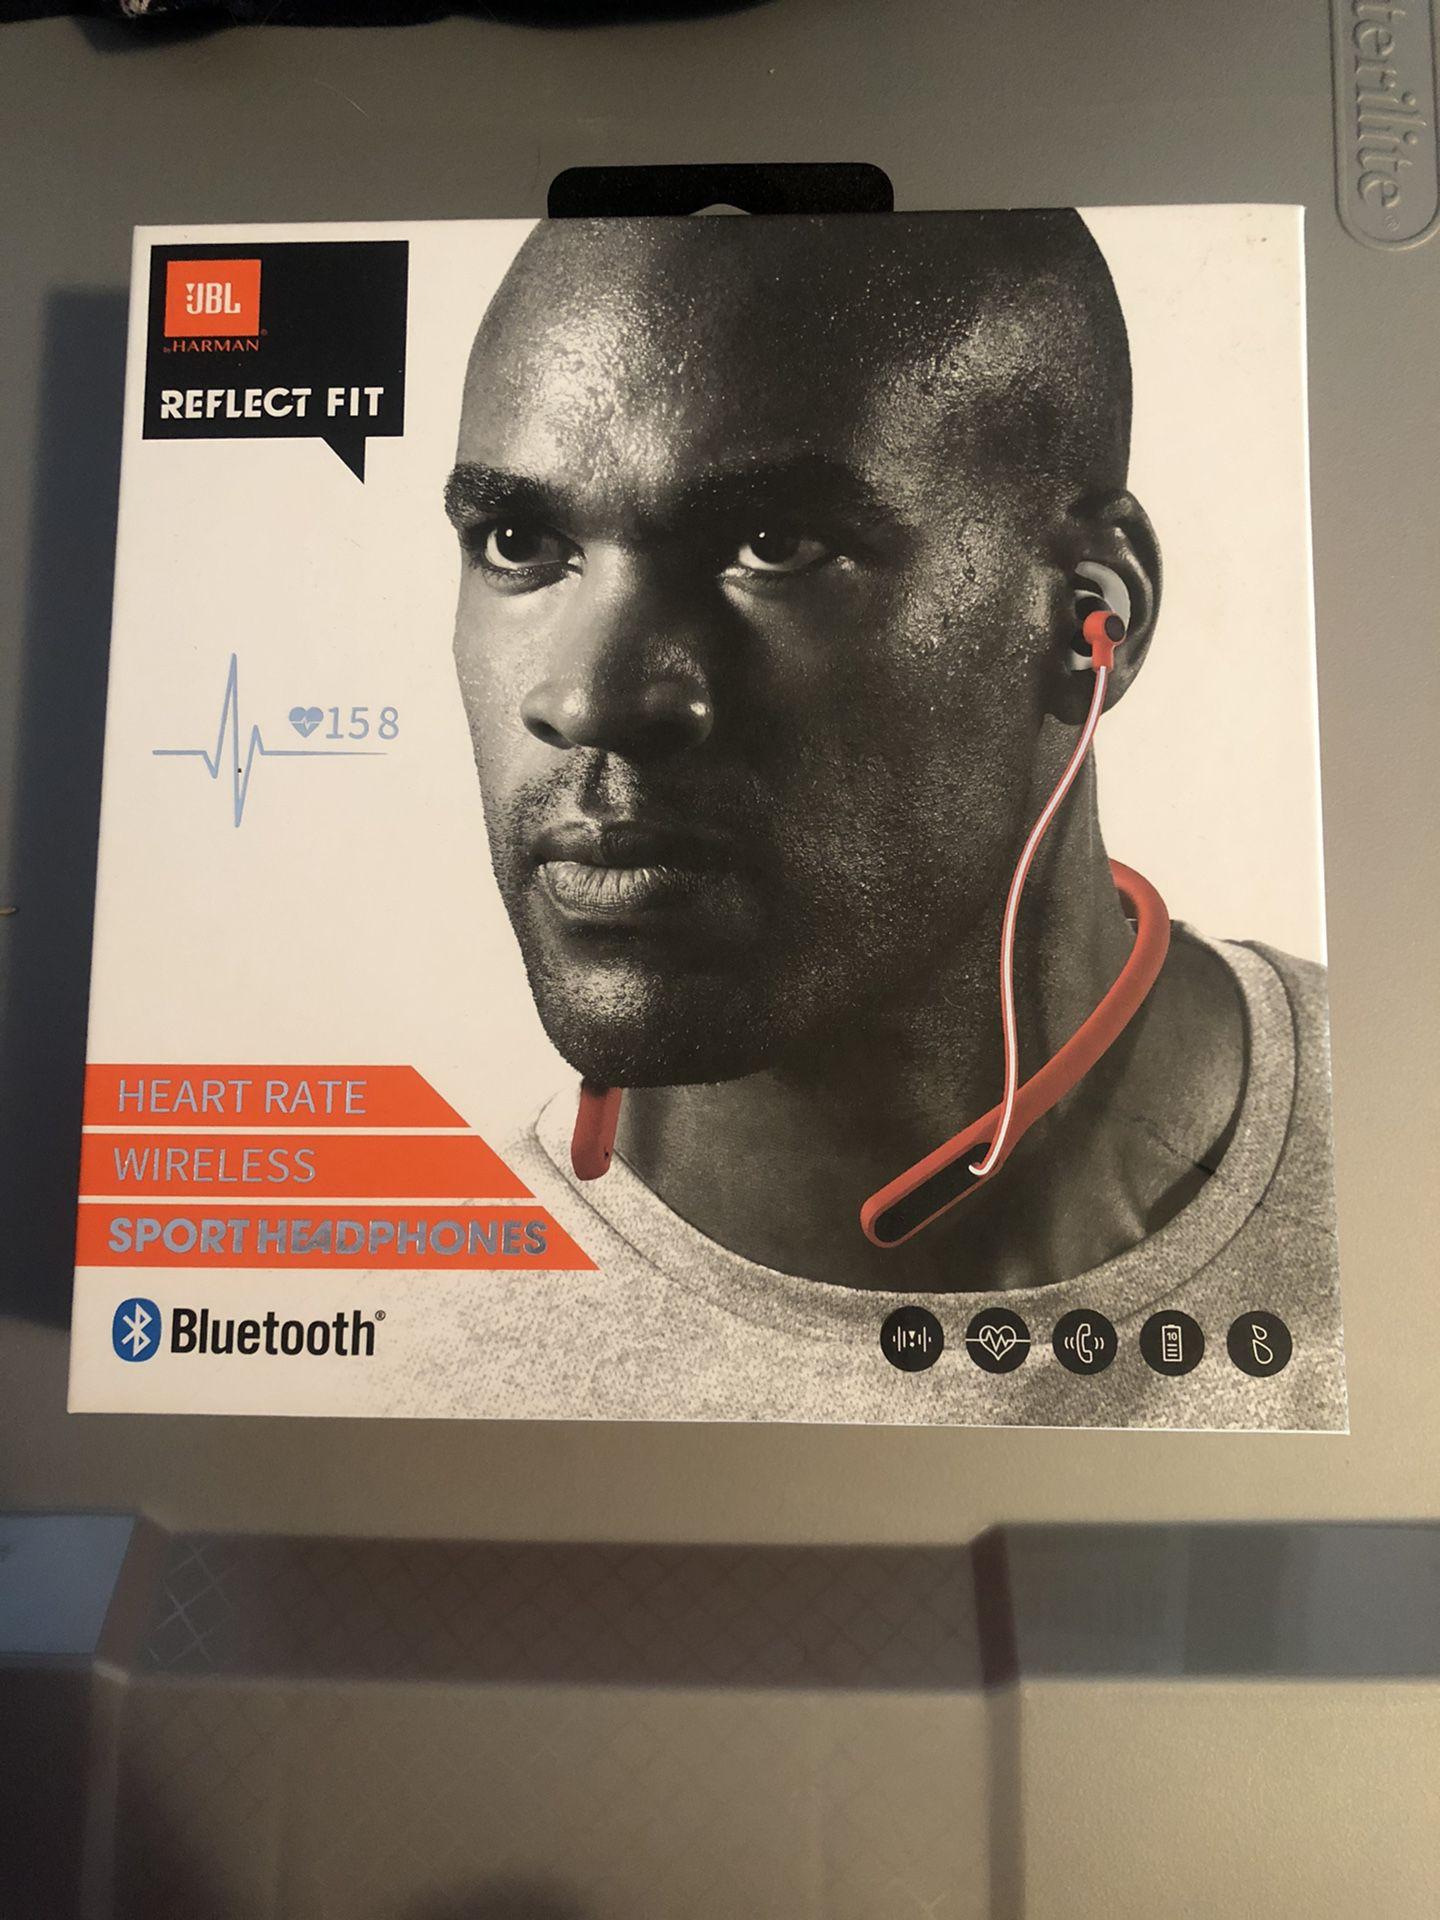 JBL Reflect Fit Heart Rate Wireless Bluetooth Sport Headphones